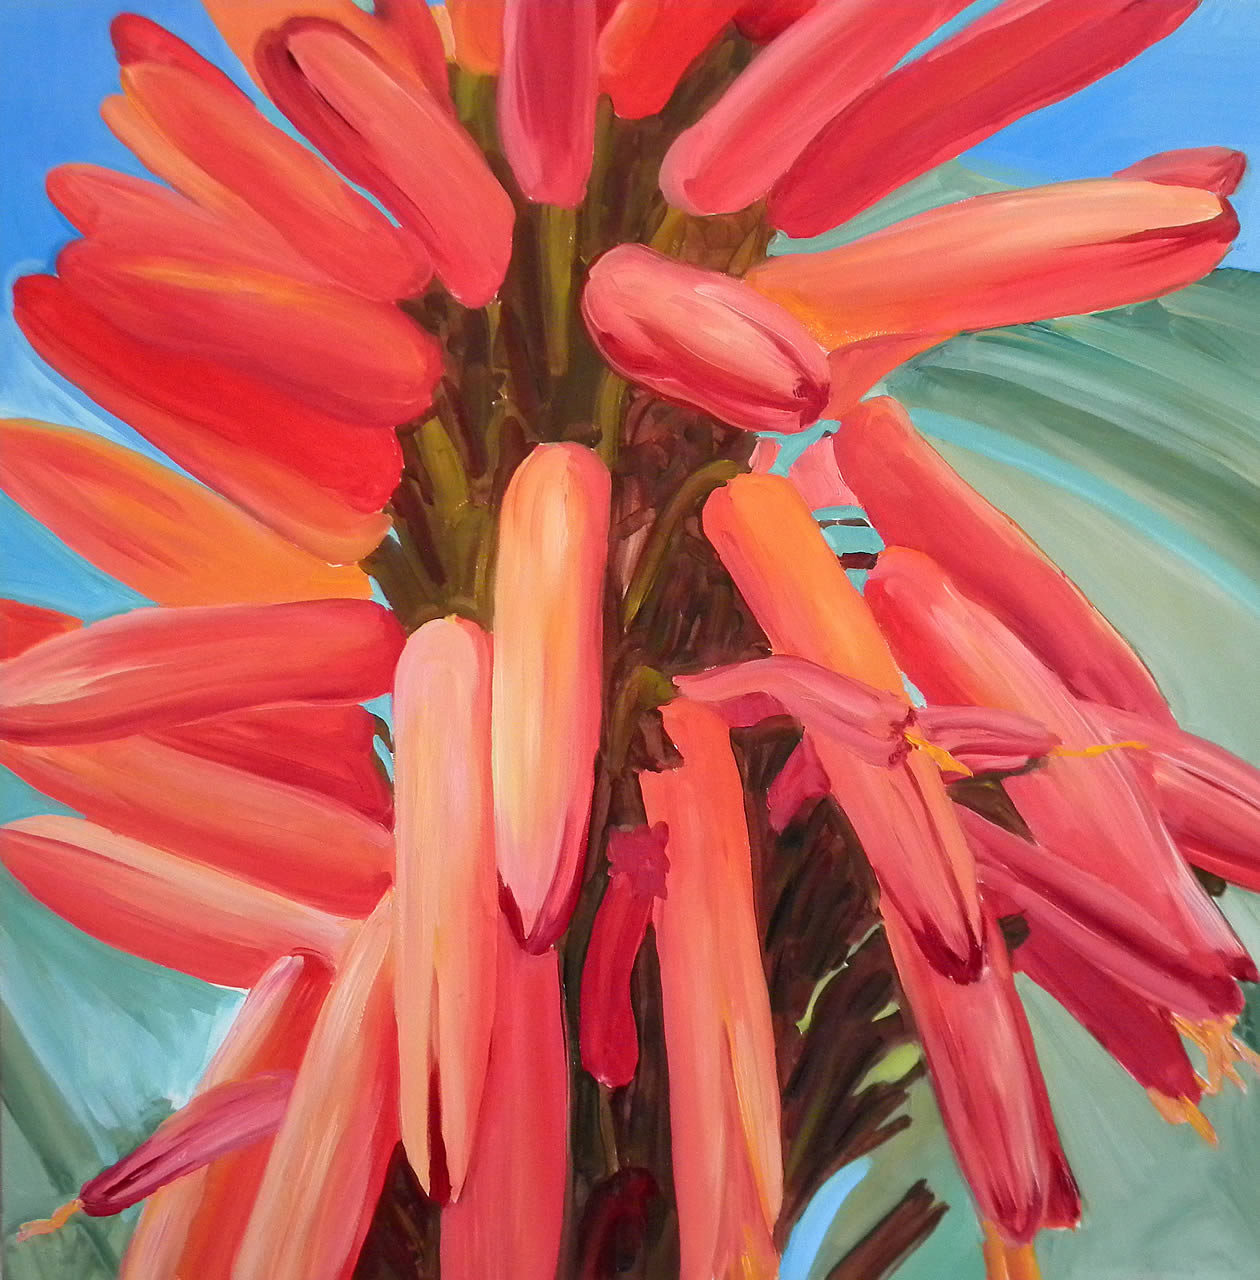 Red Aloe Vera Flowers